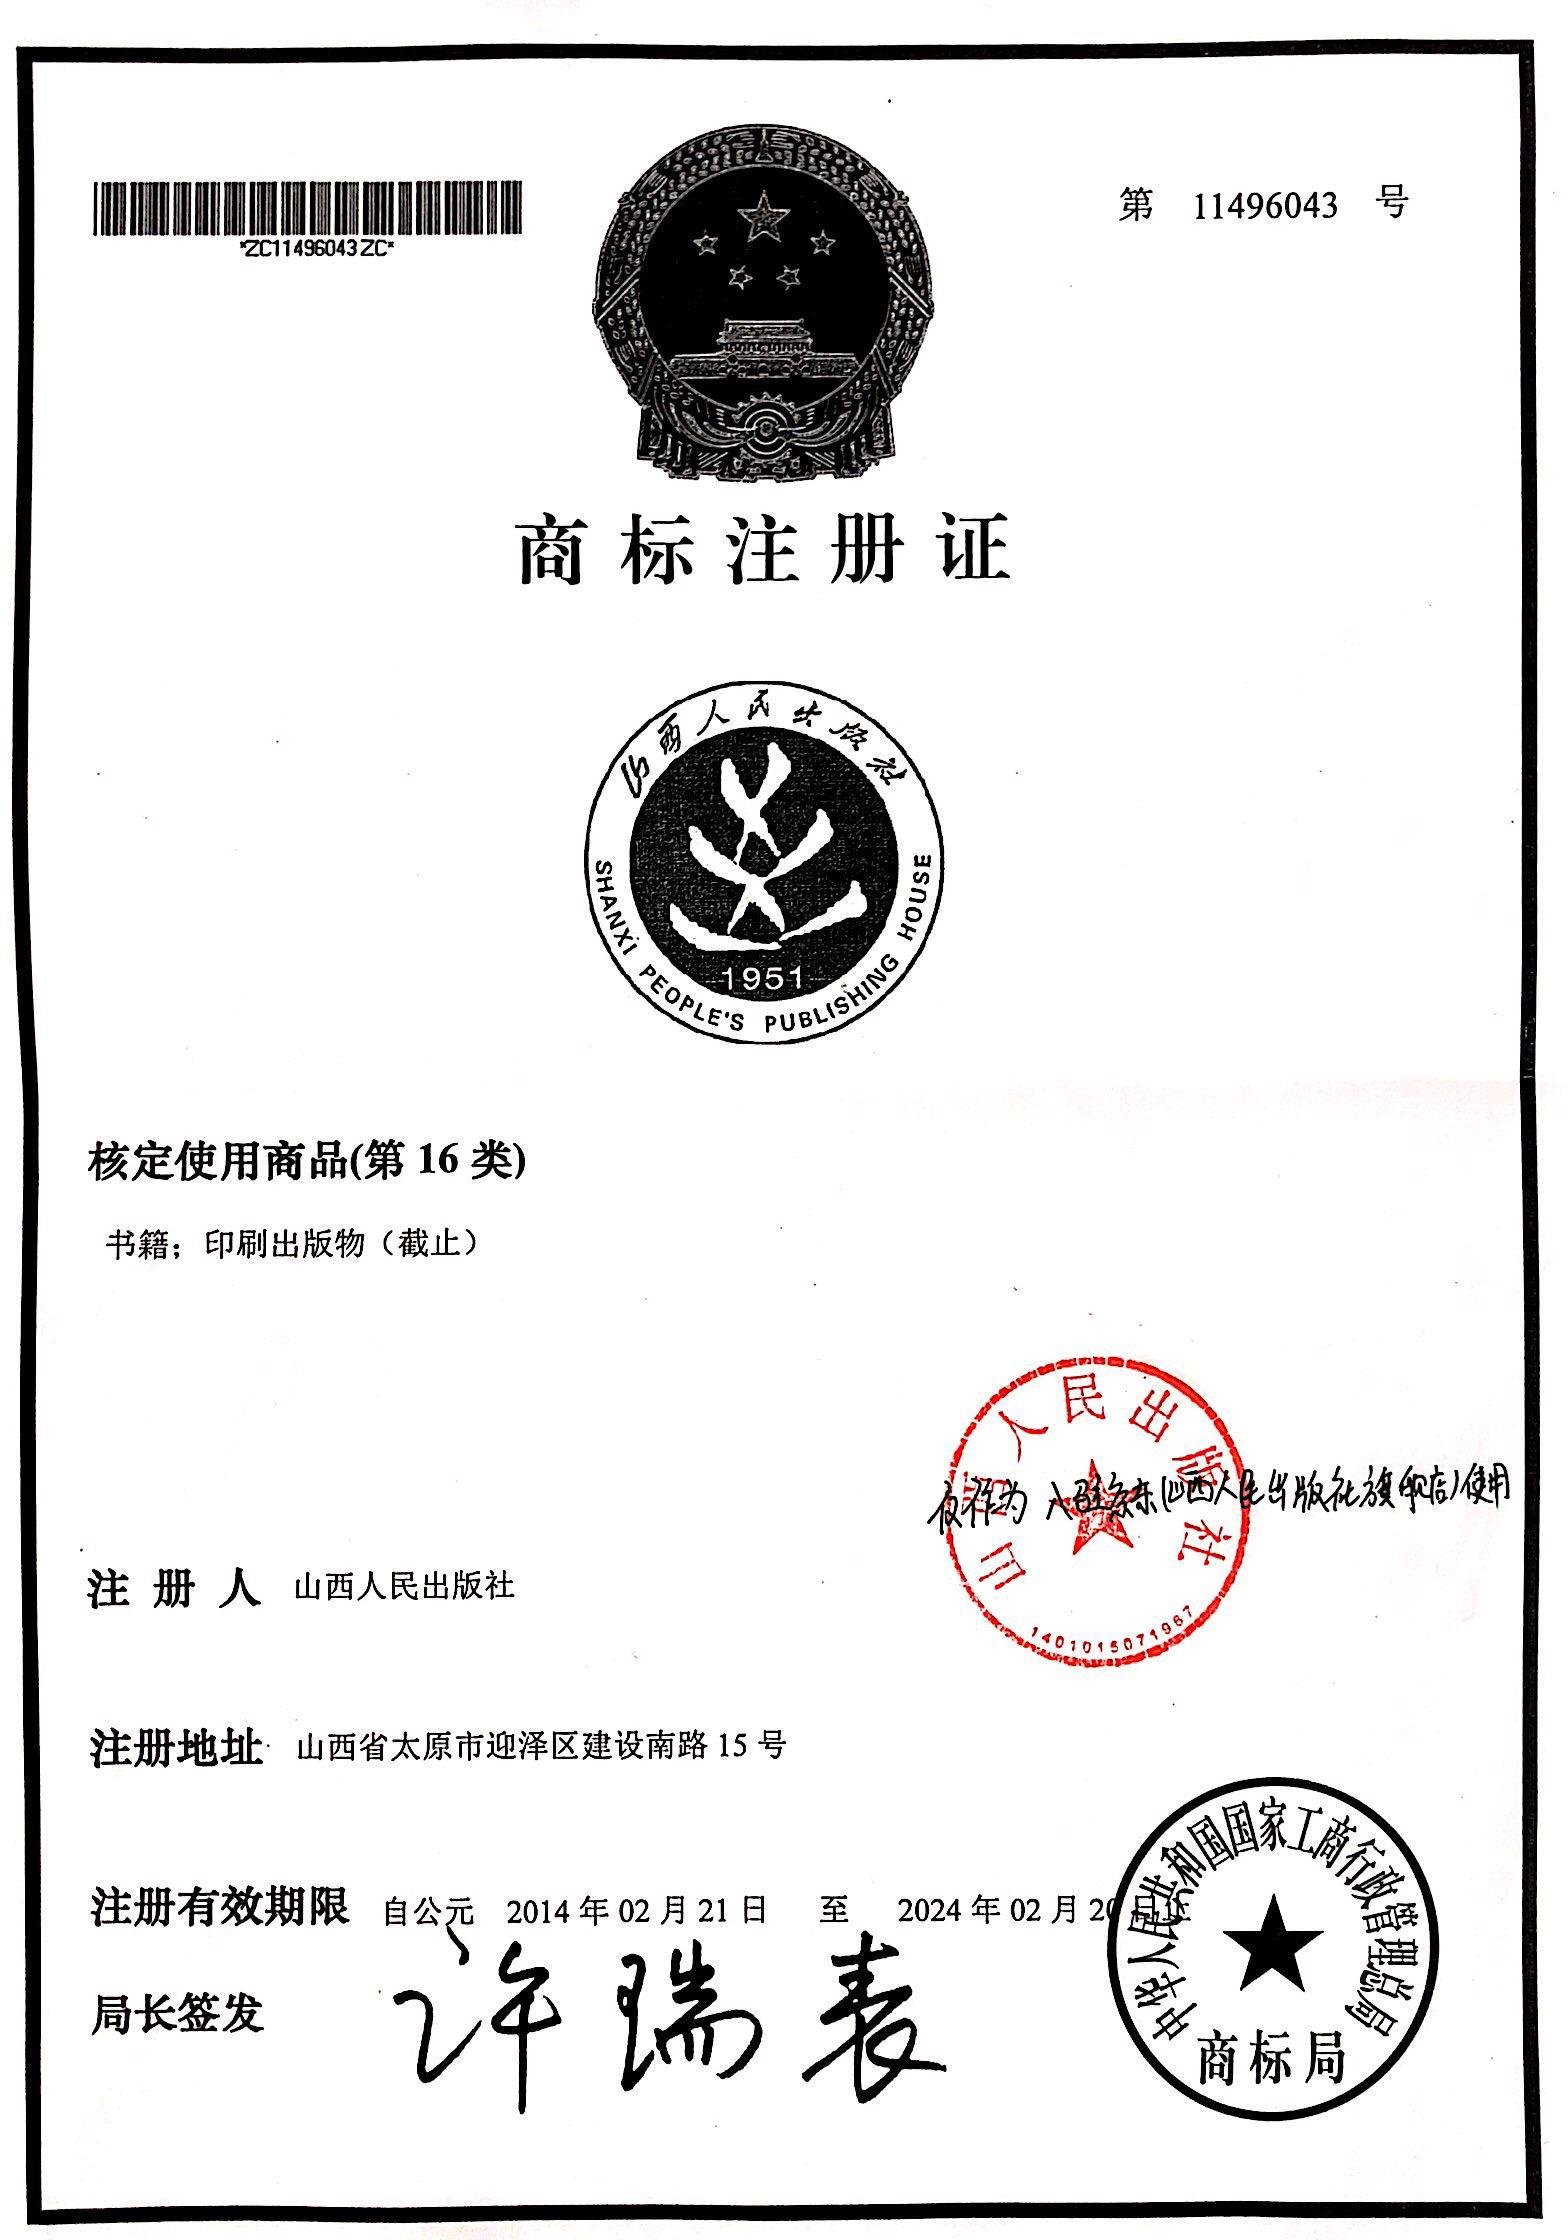 山西人民出版社(SHANXI PEOPLE'S PLBLISHING HOUSE)